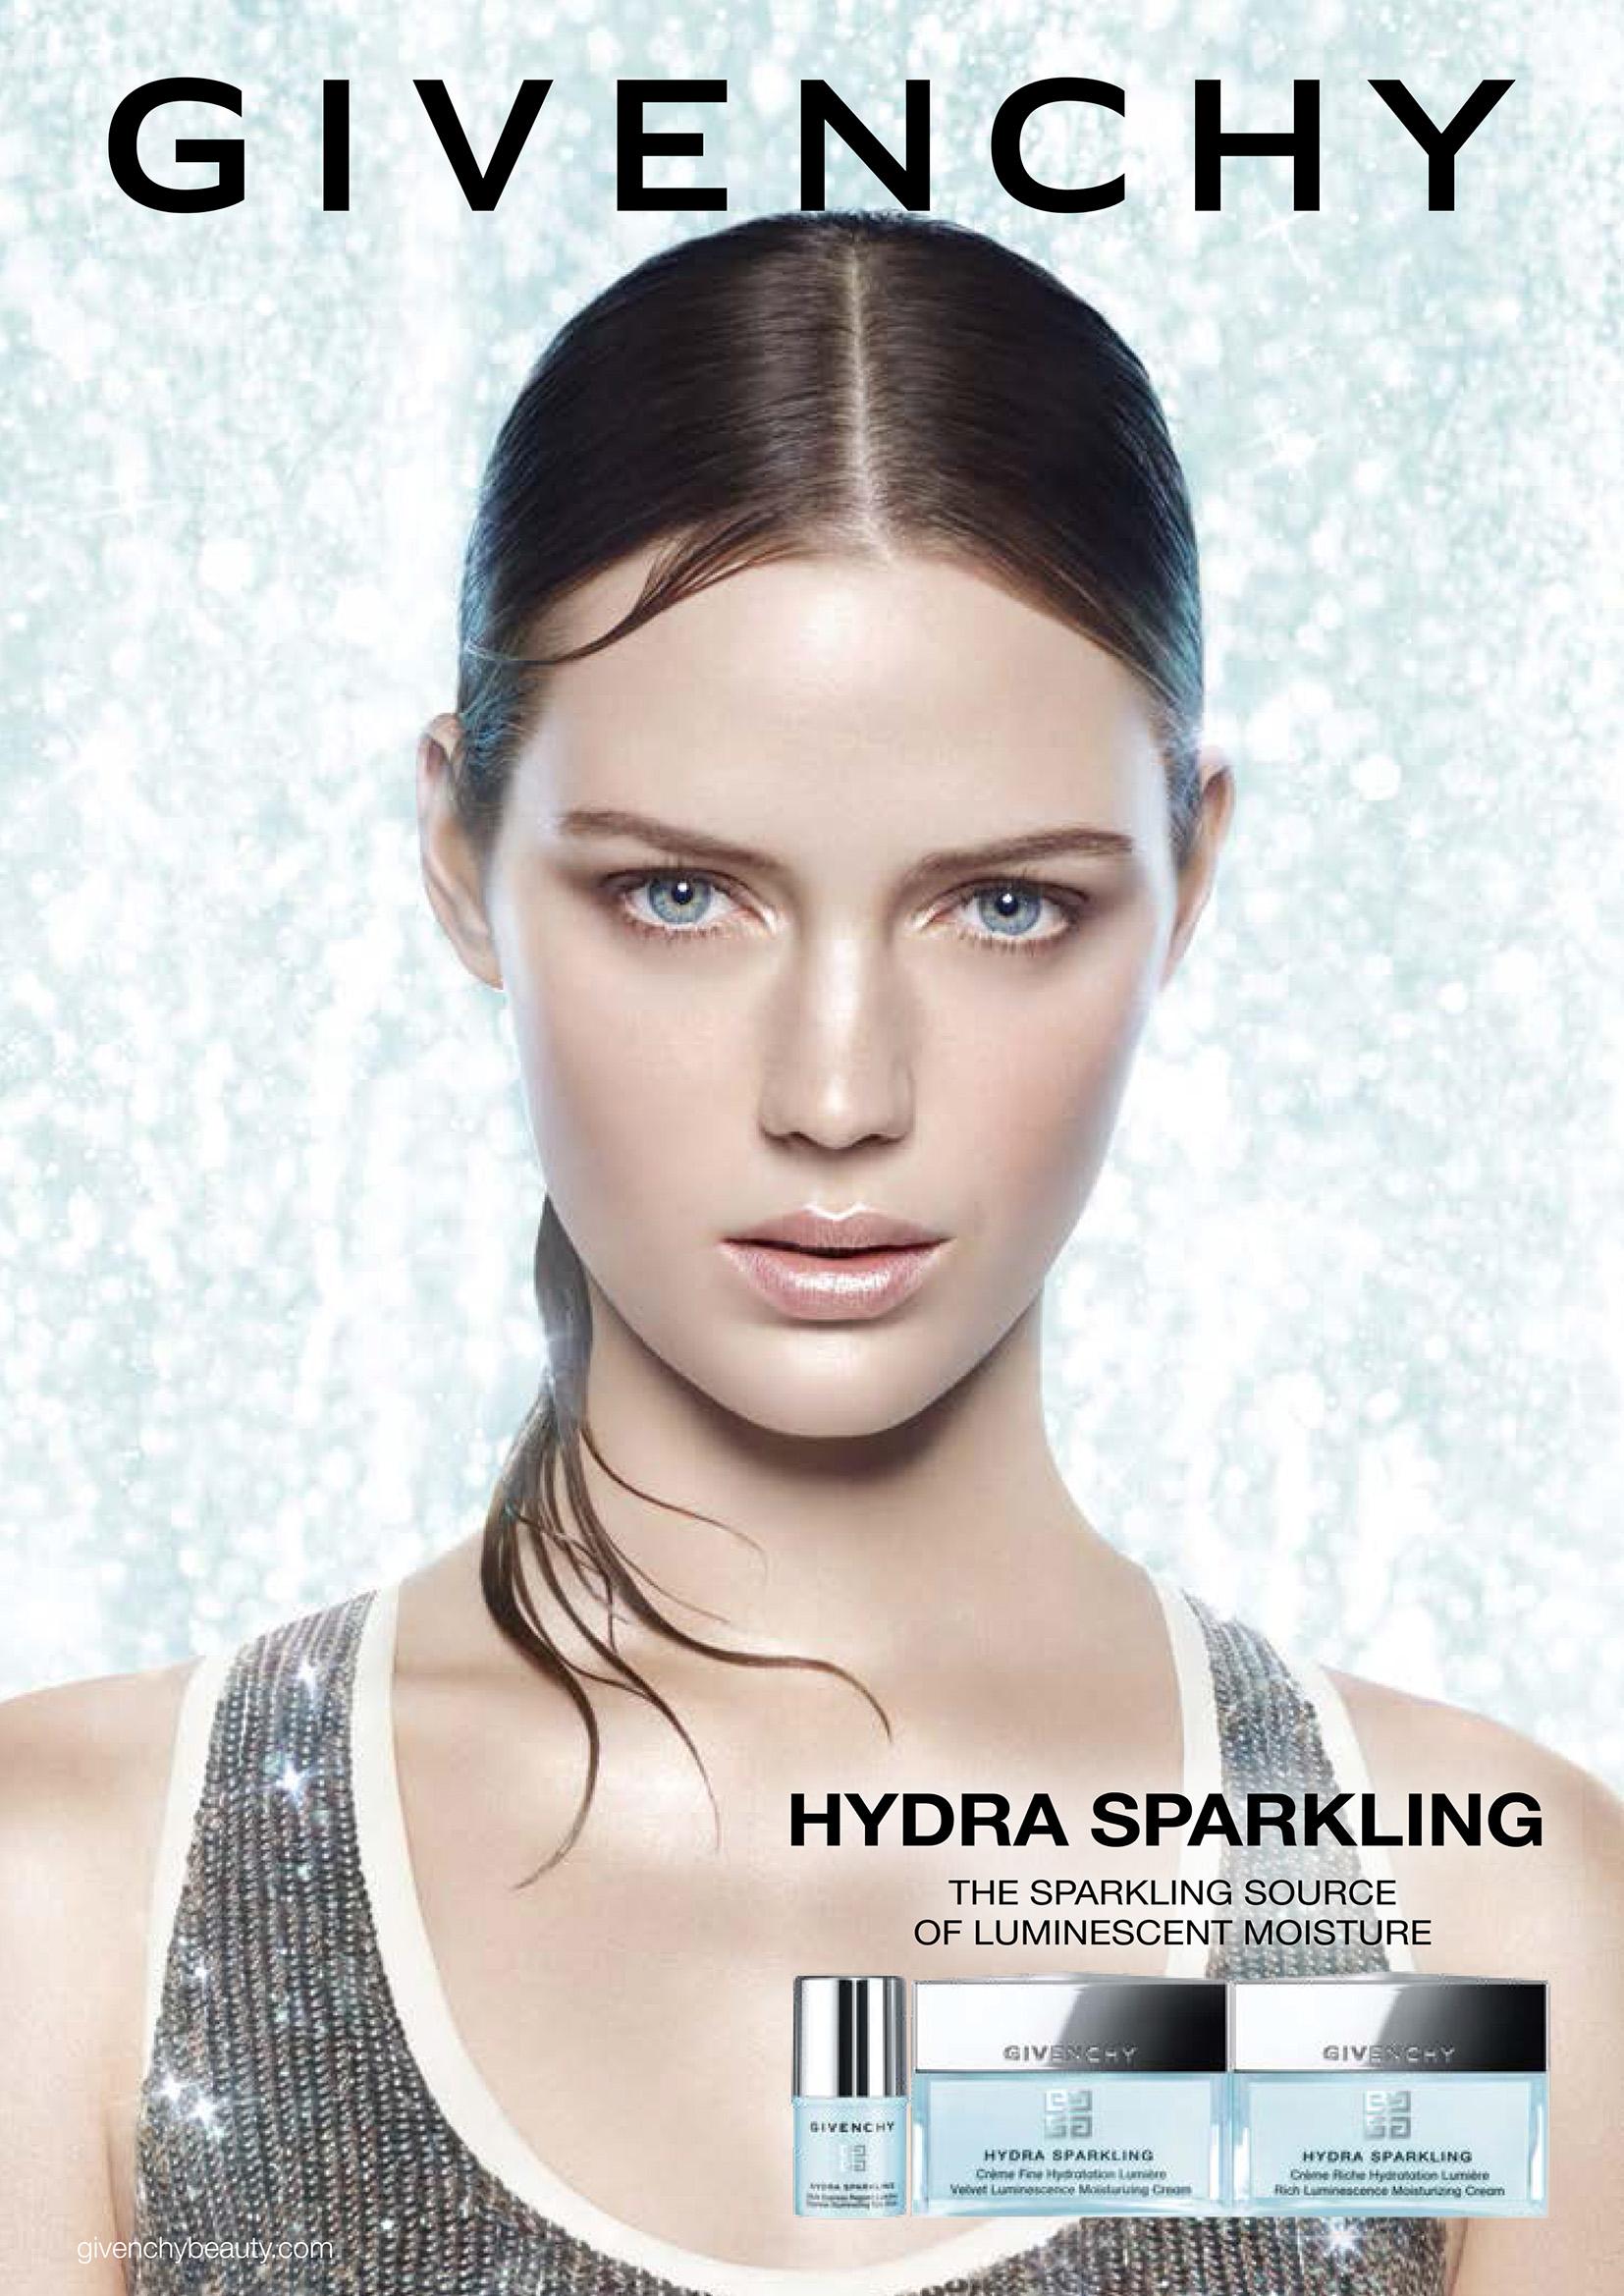 A4_PRINT_MODEL_HYDRA_SRARKLING